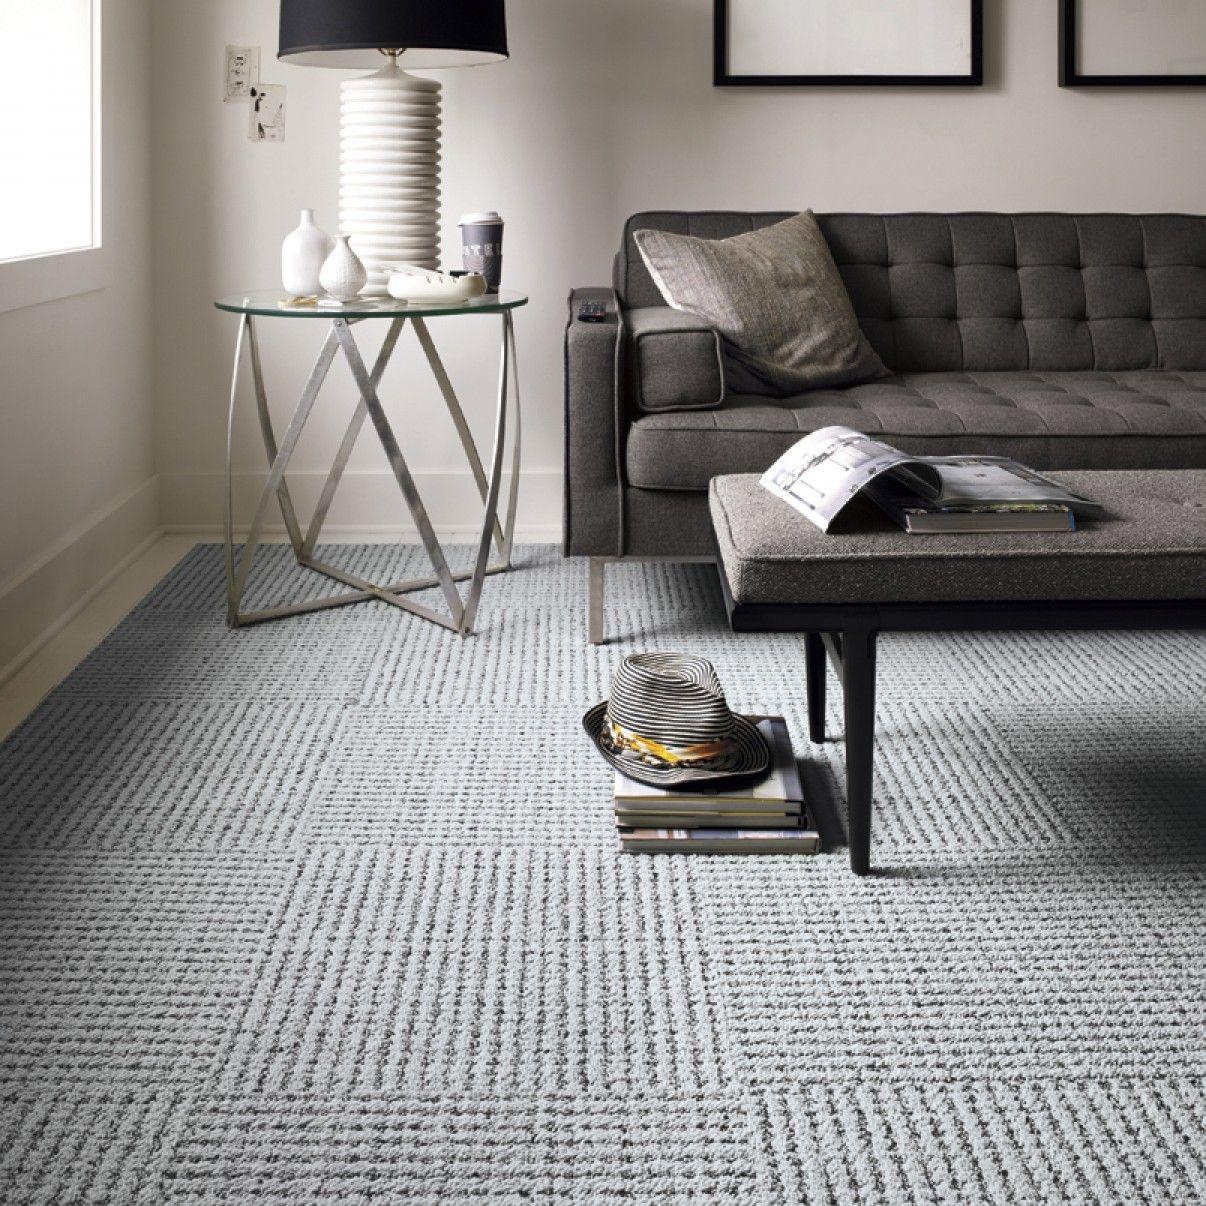 flor carpet tiles-love this chunky gray pattern for boys' room